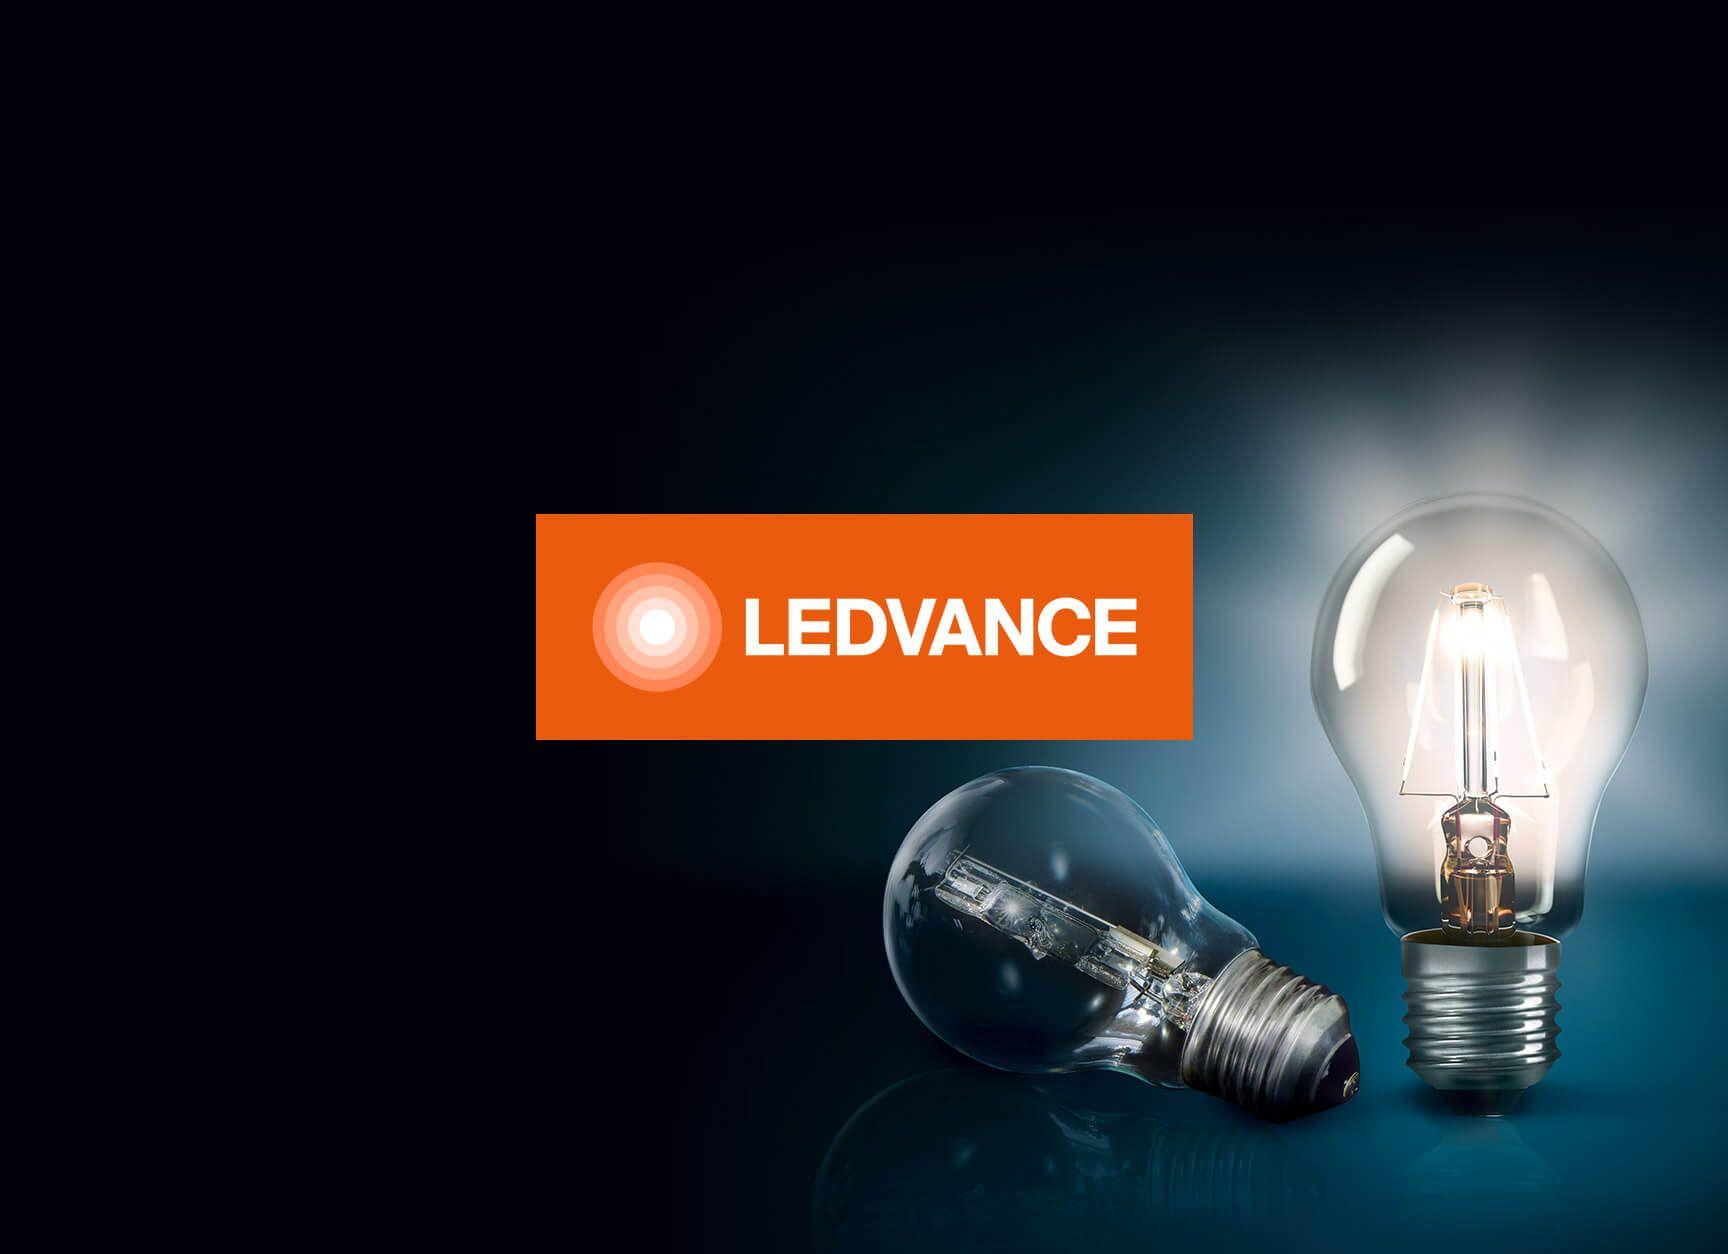 LEDVANCE steigert die digitale Marketplace Performance mit diva-e Technologie E PWR